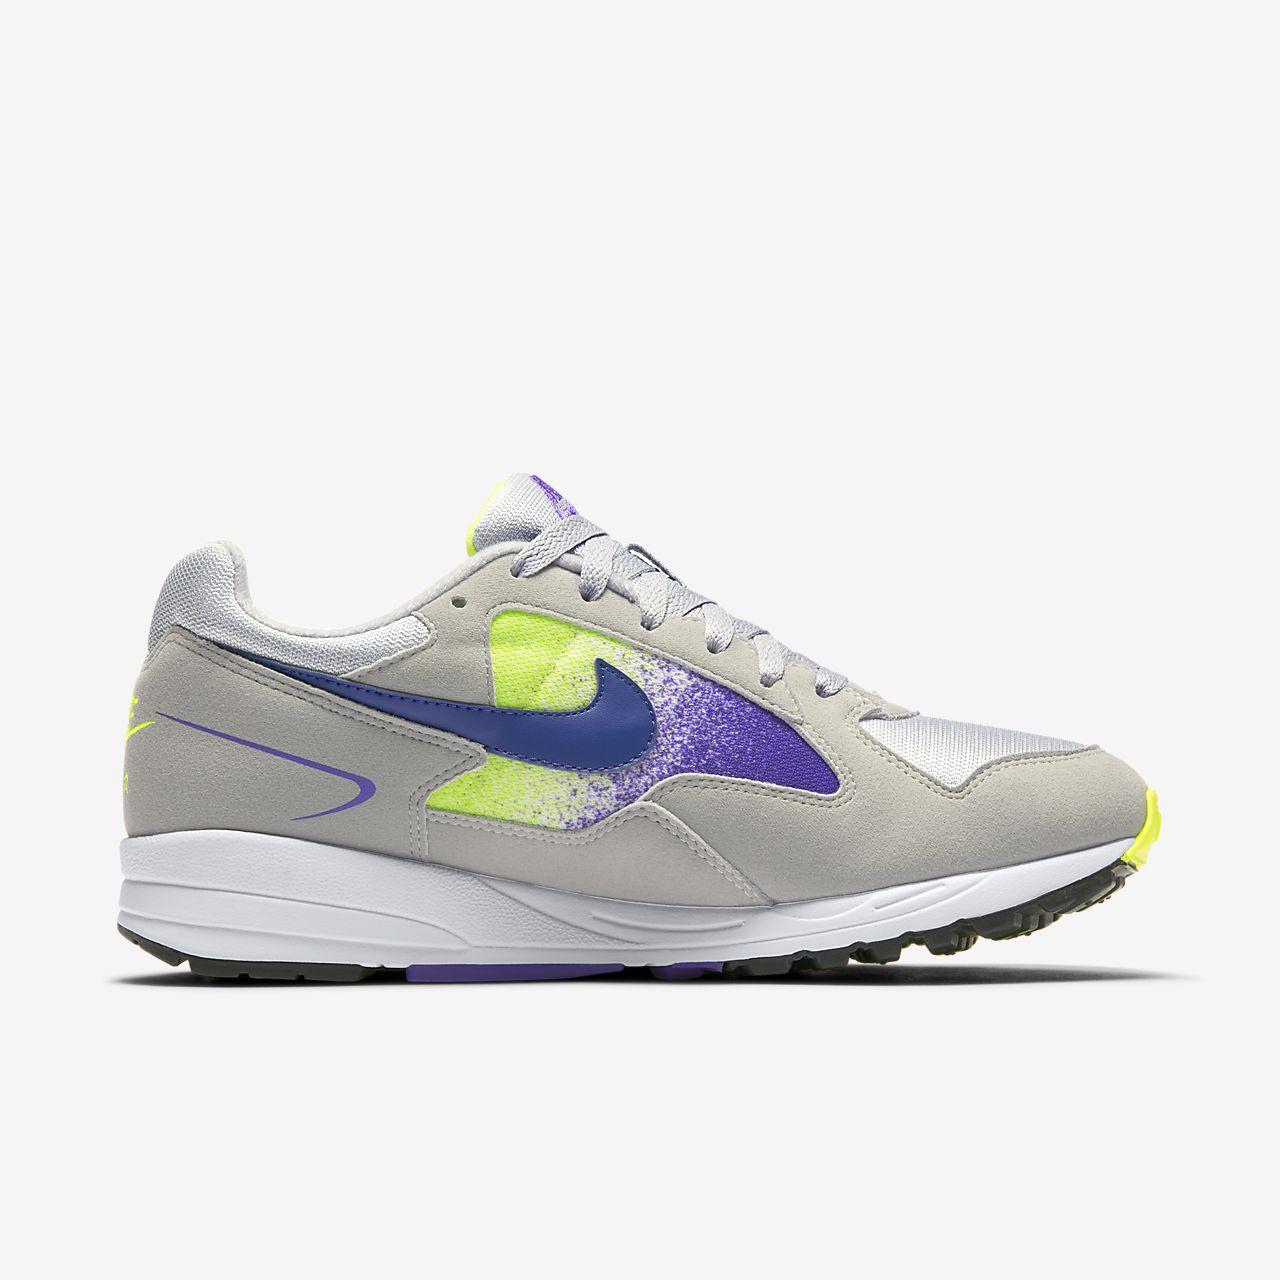 b42cf74965a7b Nike Air Skylon II Men s Shoe. Nike.com CA